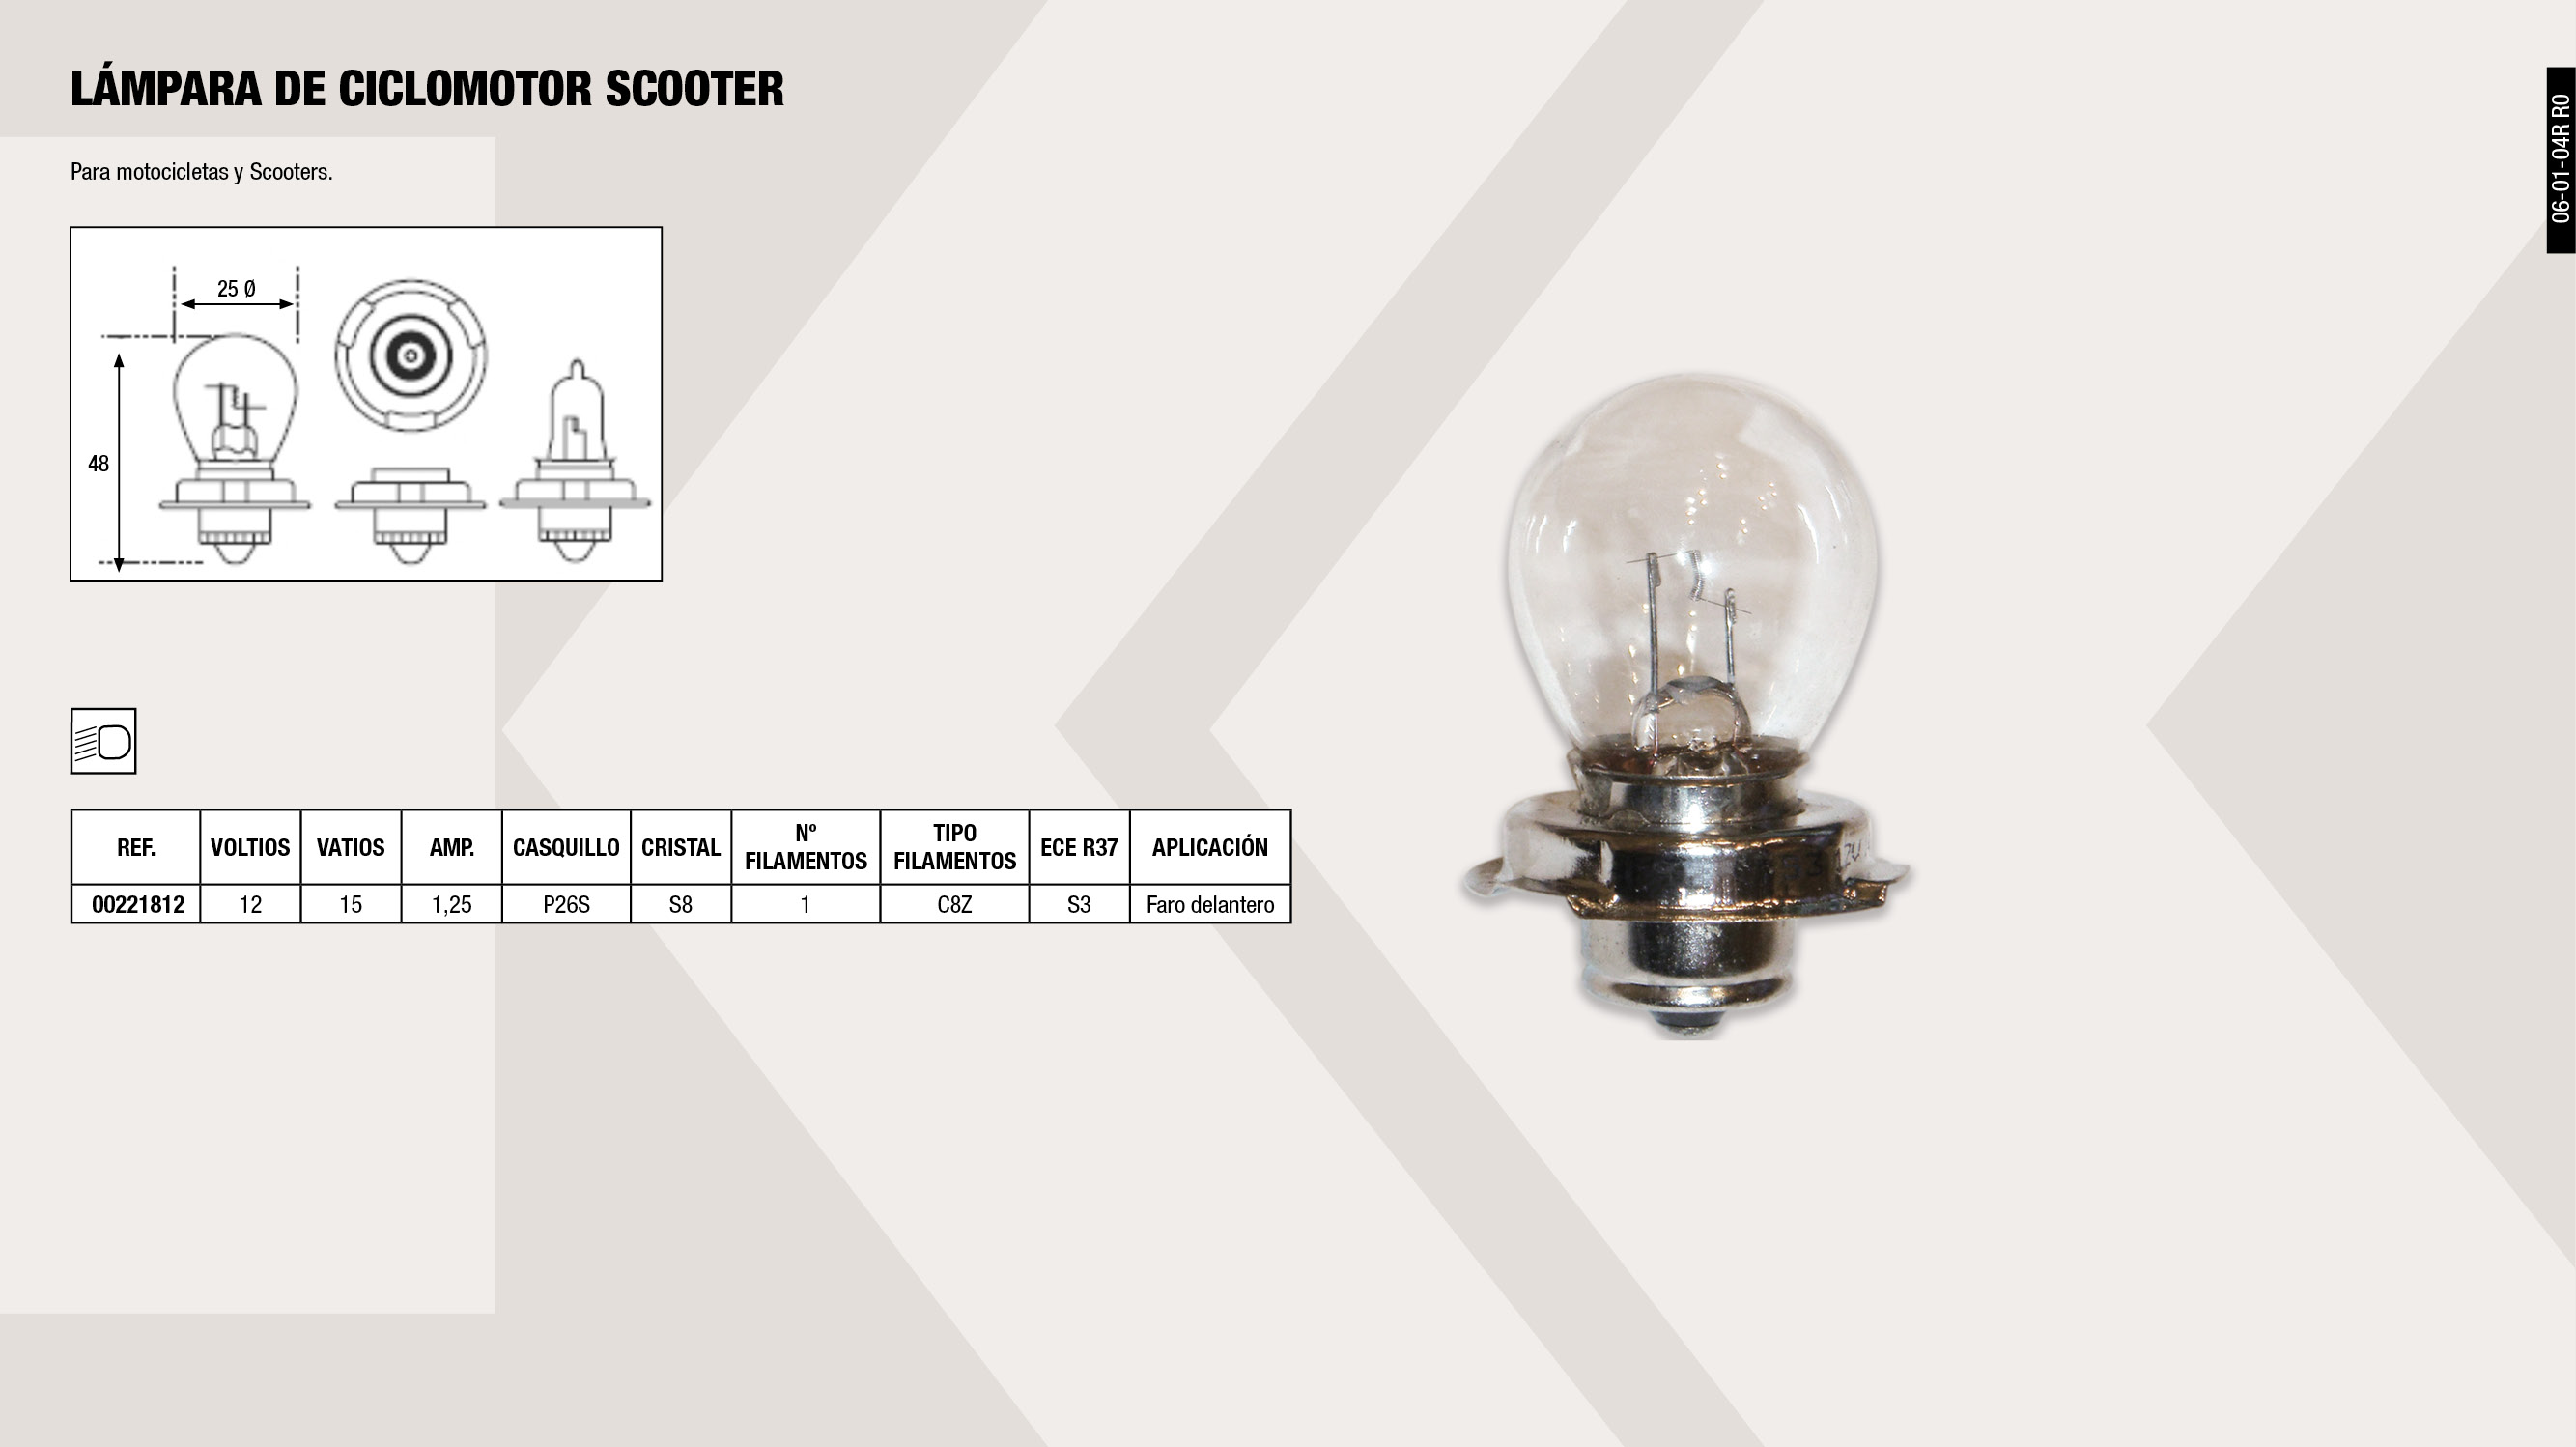 LAMPARA CICLOMOTOR P26 SCOOTER 12V.15W.P26S (S-3)           ,